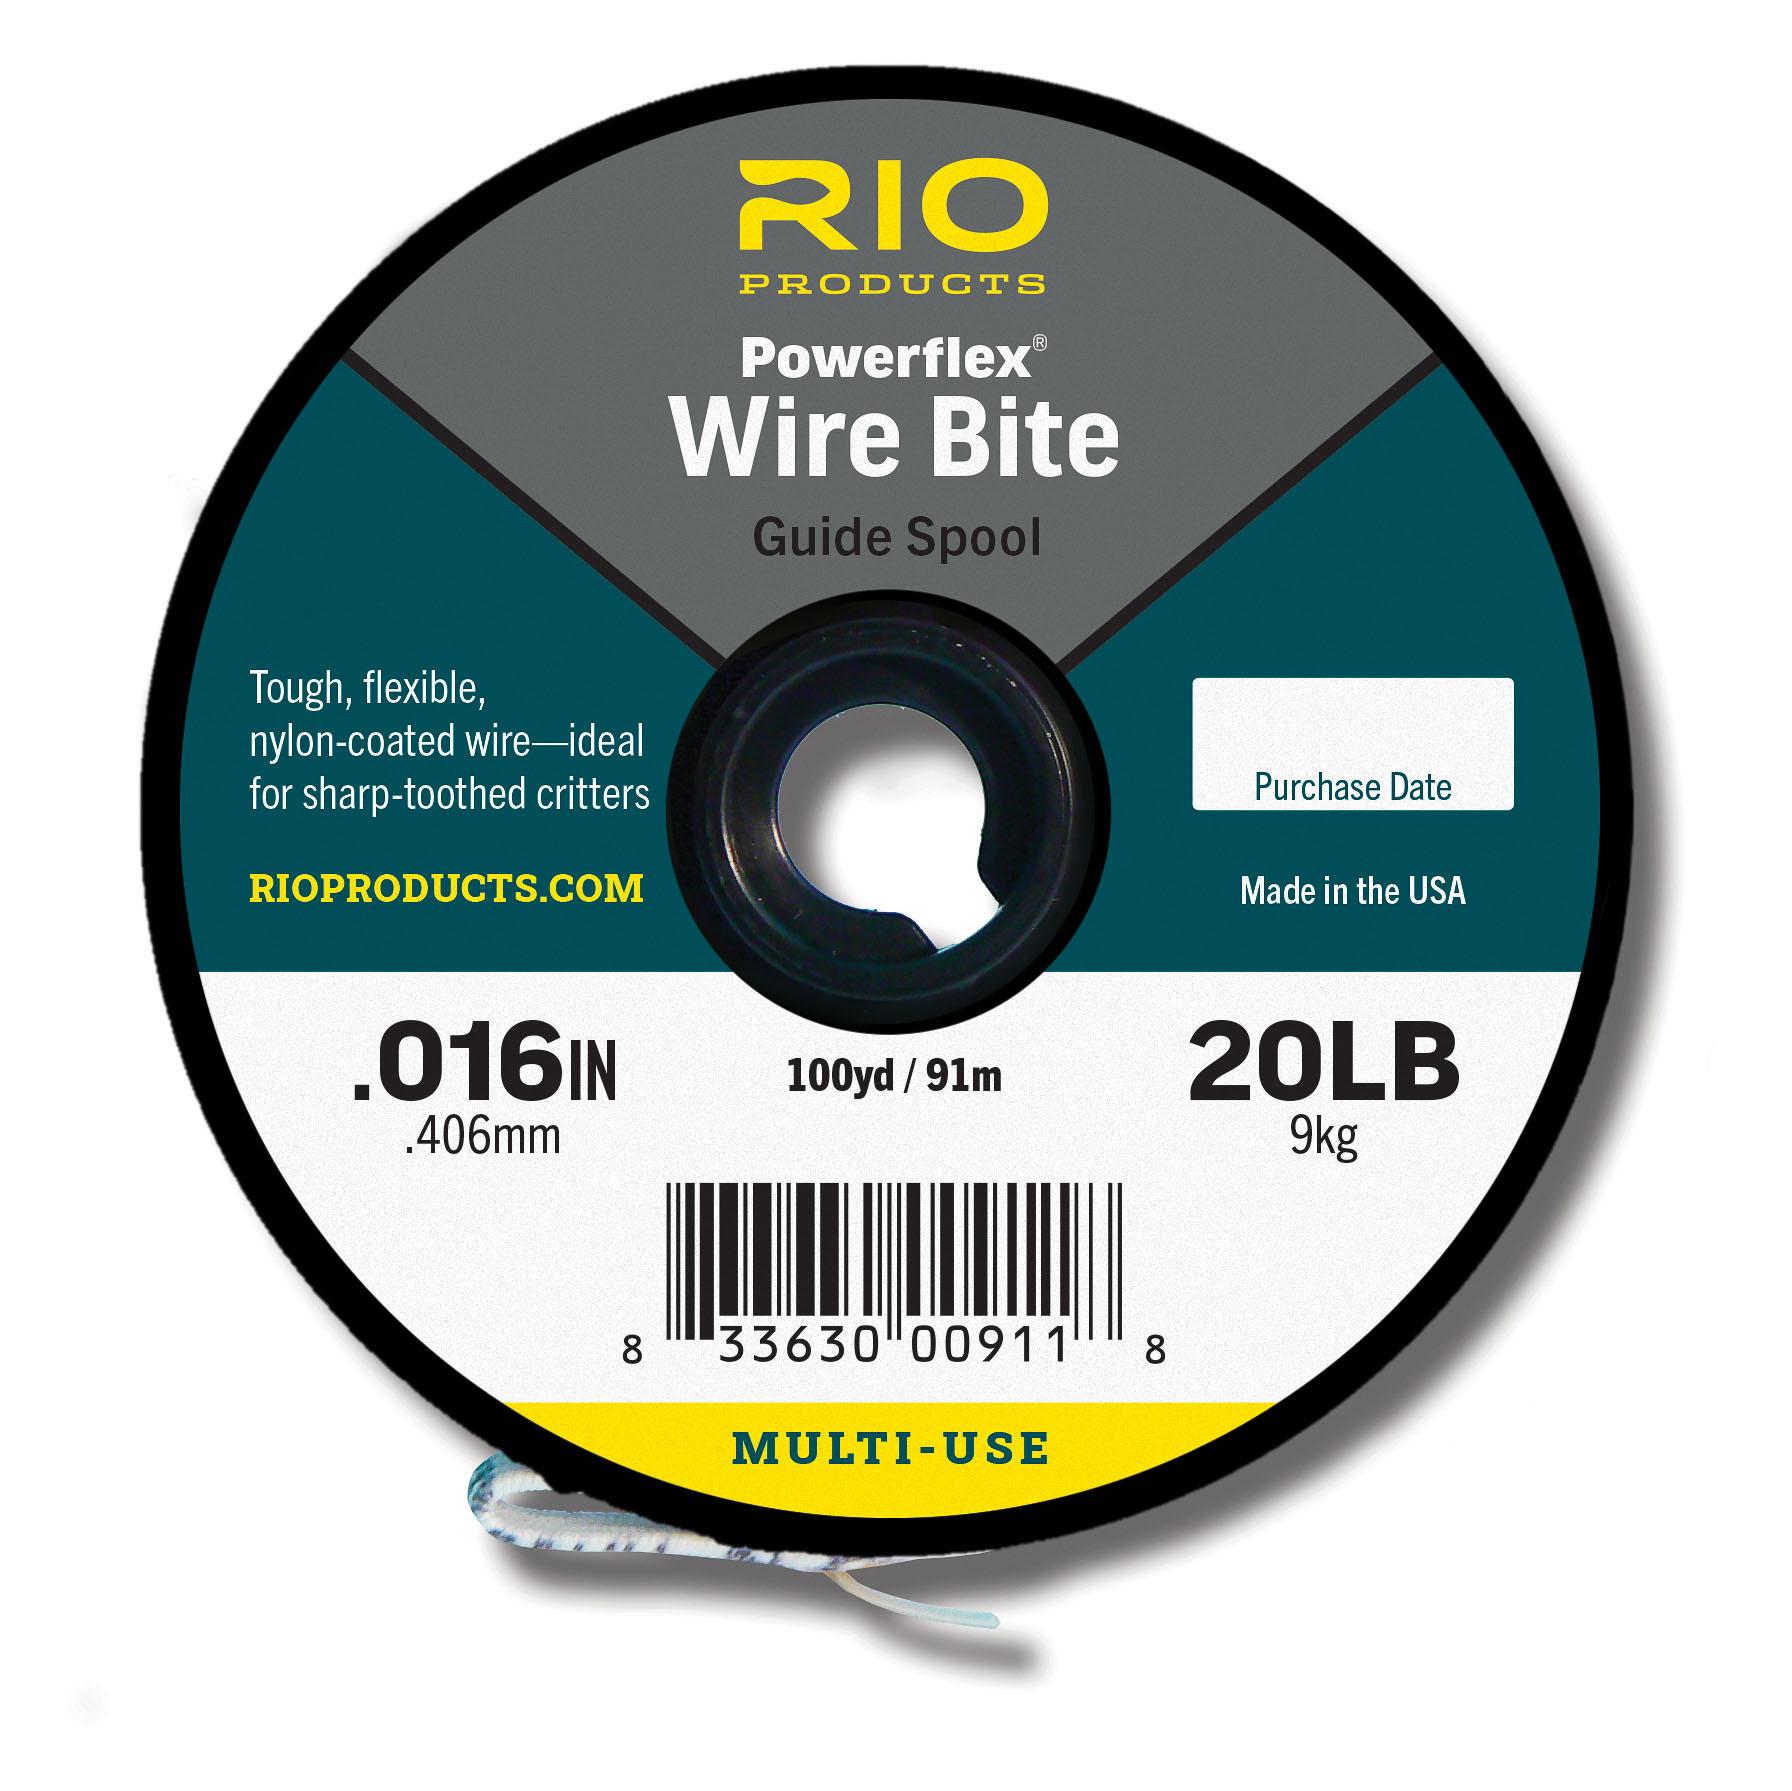 Rio Powerflex Wirebite